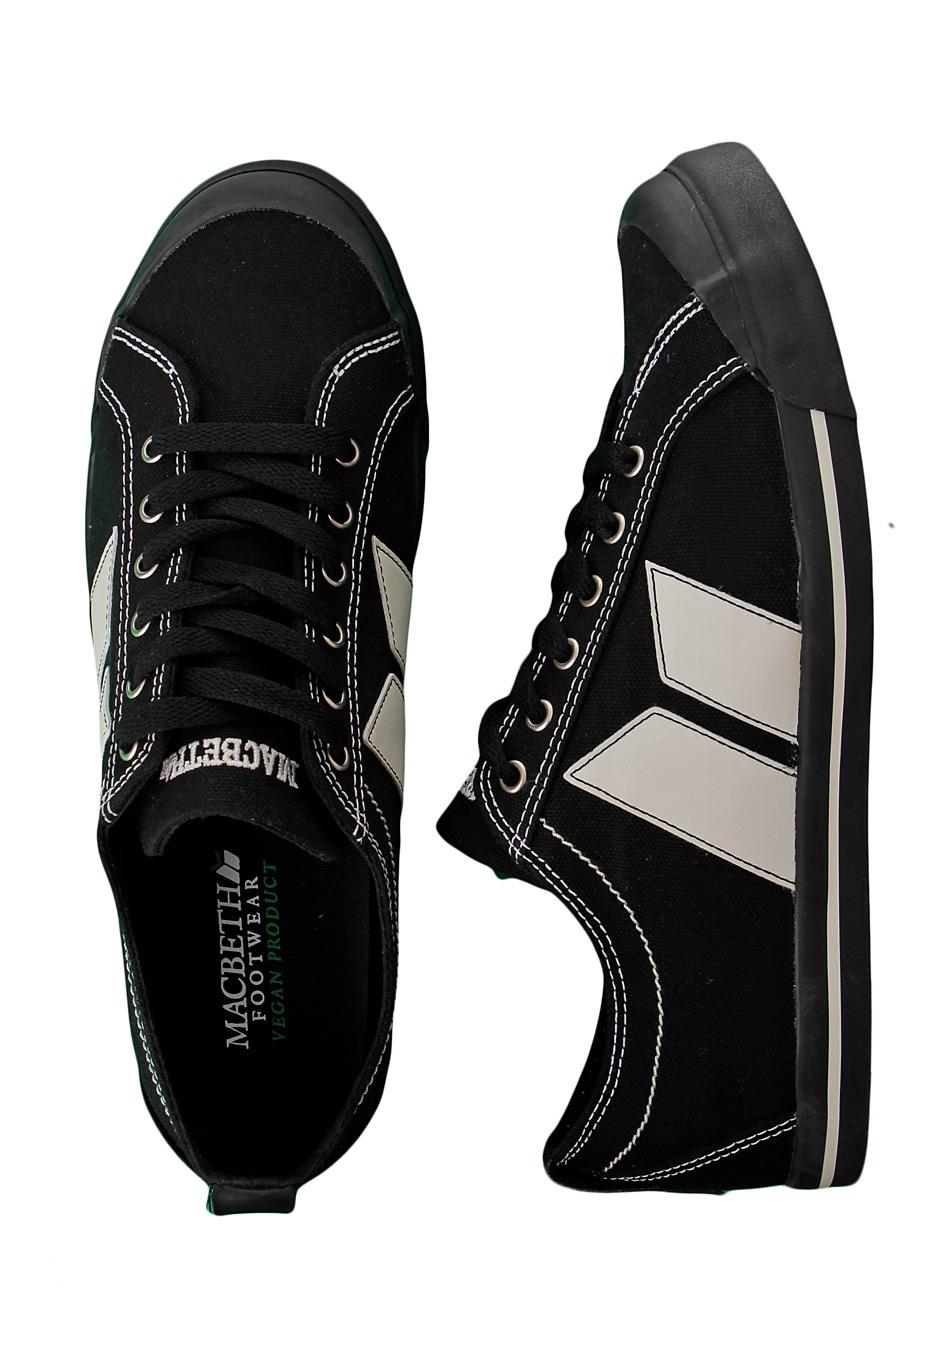 Macbeth - Streetwear boutique en ligne officielle ... | 936 x 1353 jpeg 192kB